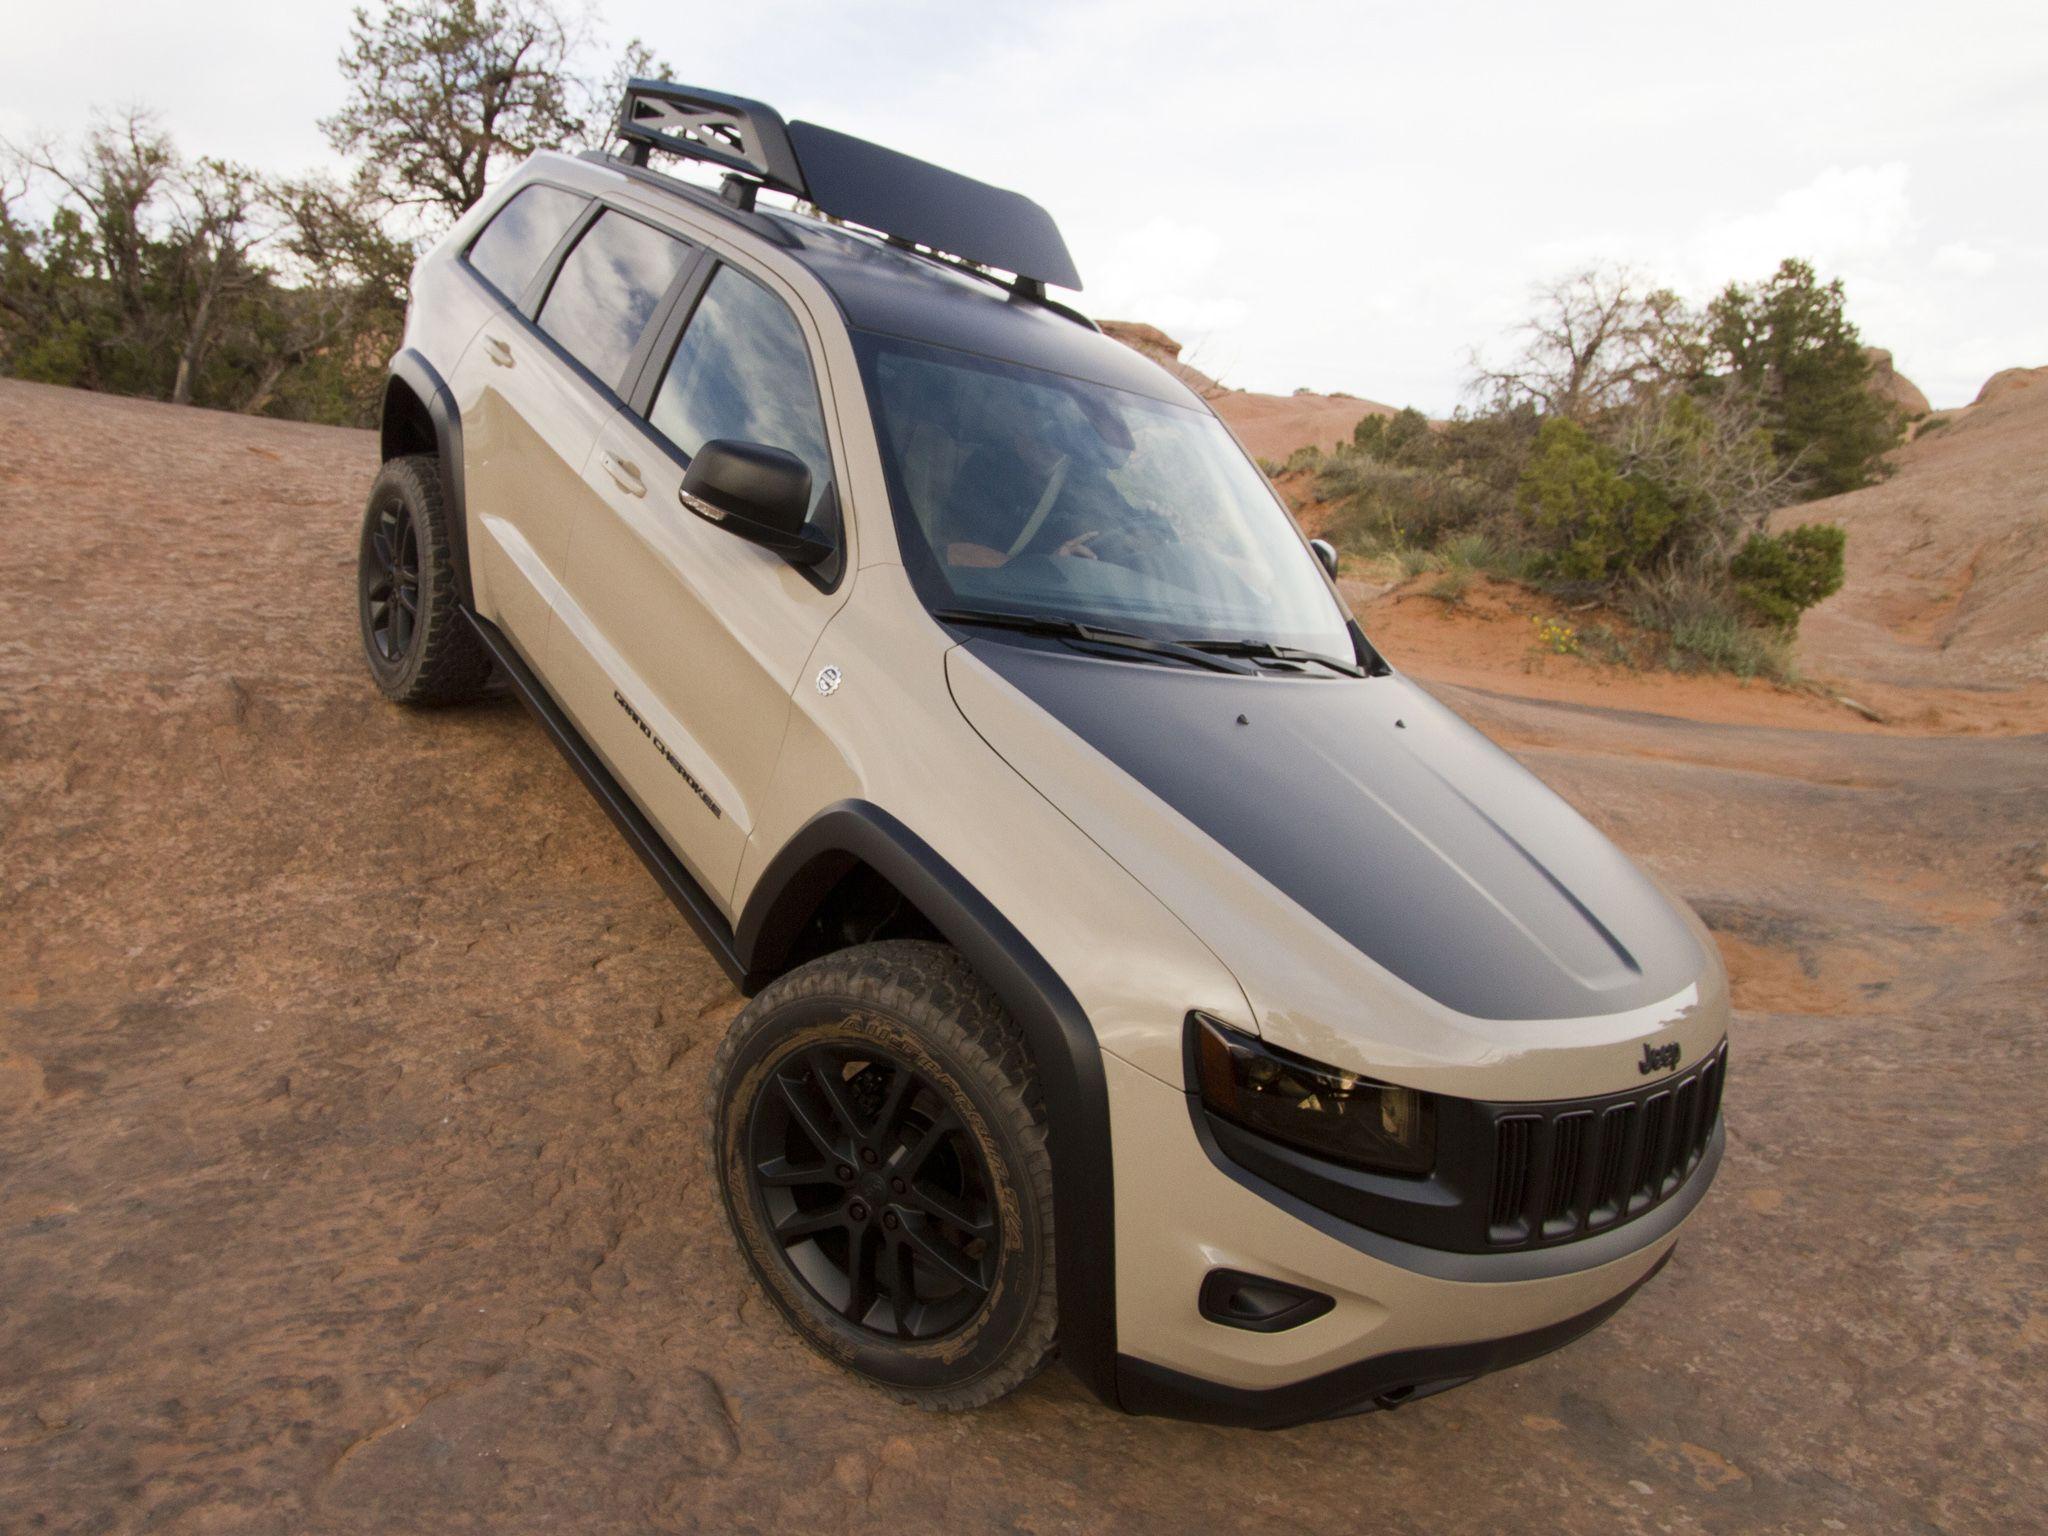 Jeep Grand Cherokee Trail Warrior Concept Wk2 04 2014 Jeep